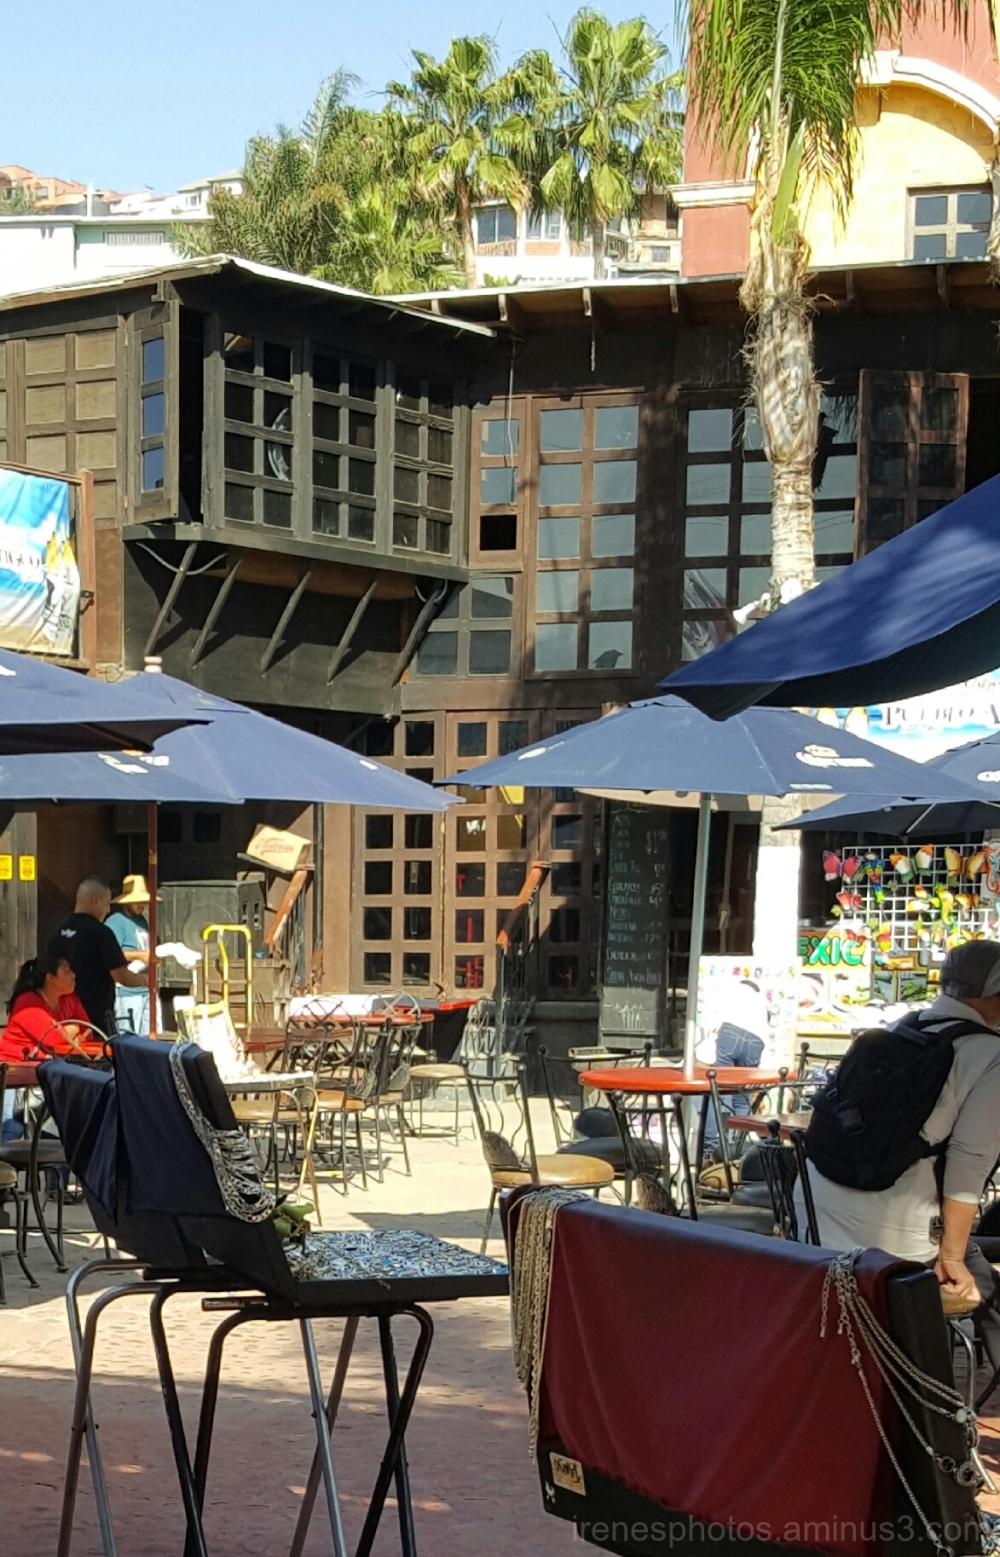 Adventure to Ensenada, Mexico #36